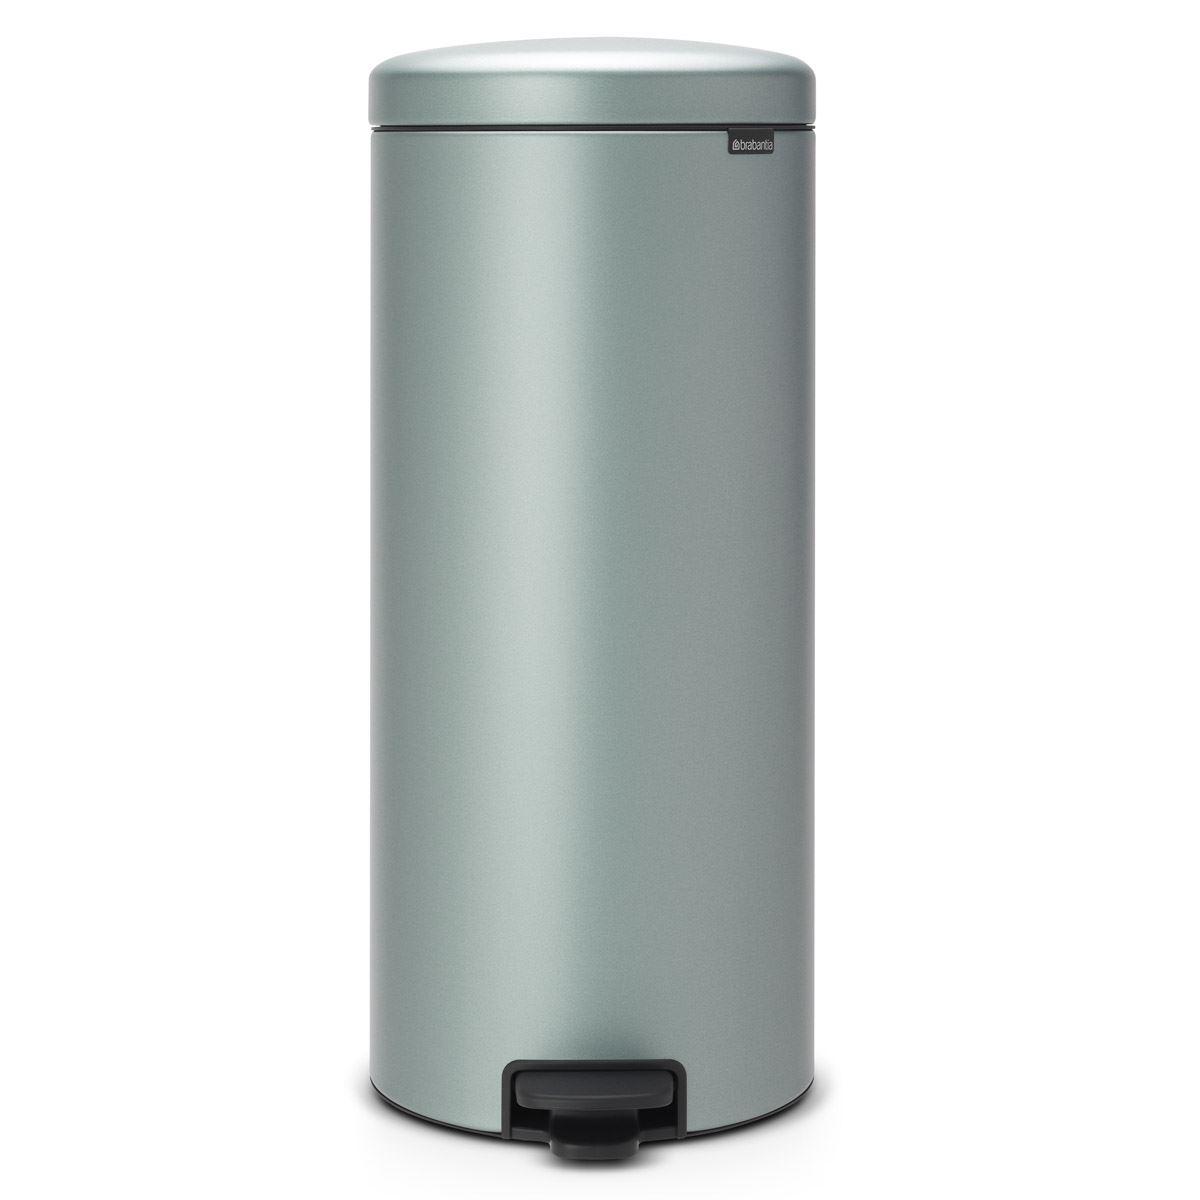 Brabantia newIcon Pedal Bin 30 Litre Plastic Bucket Metallic Mint